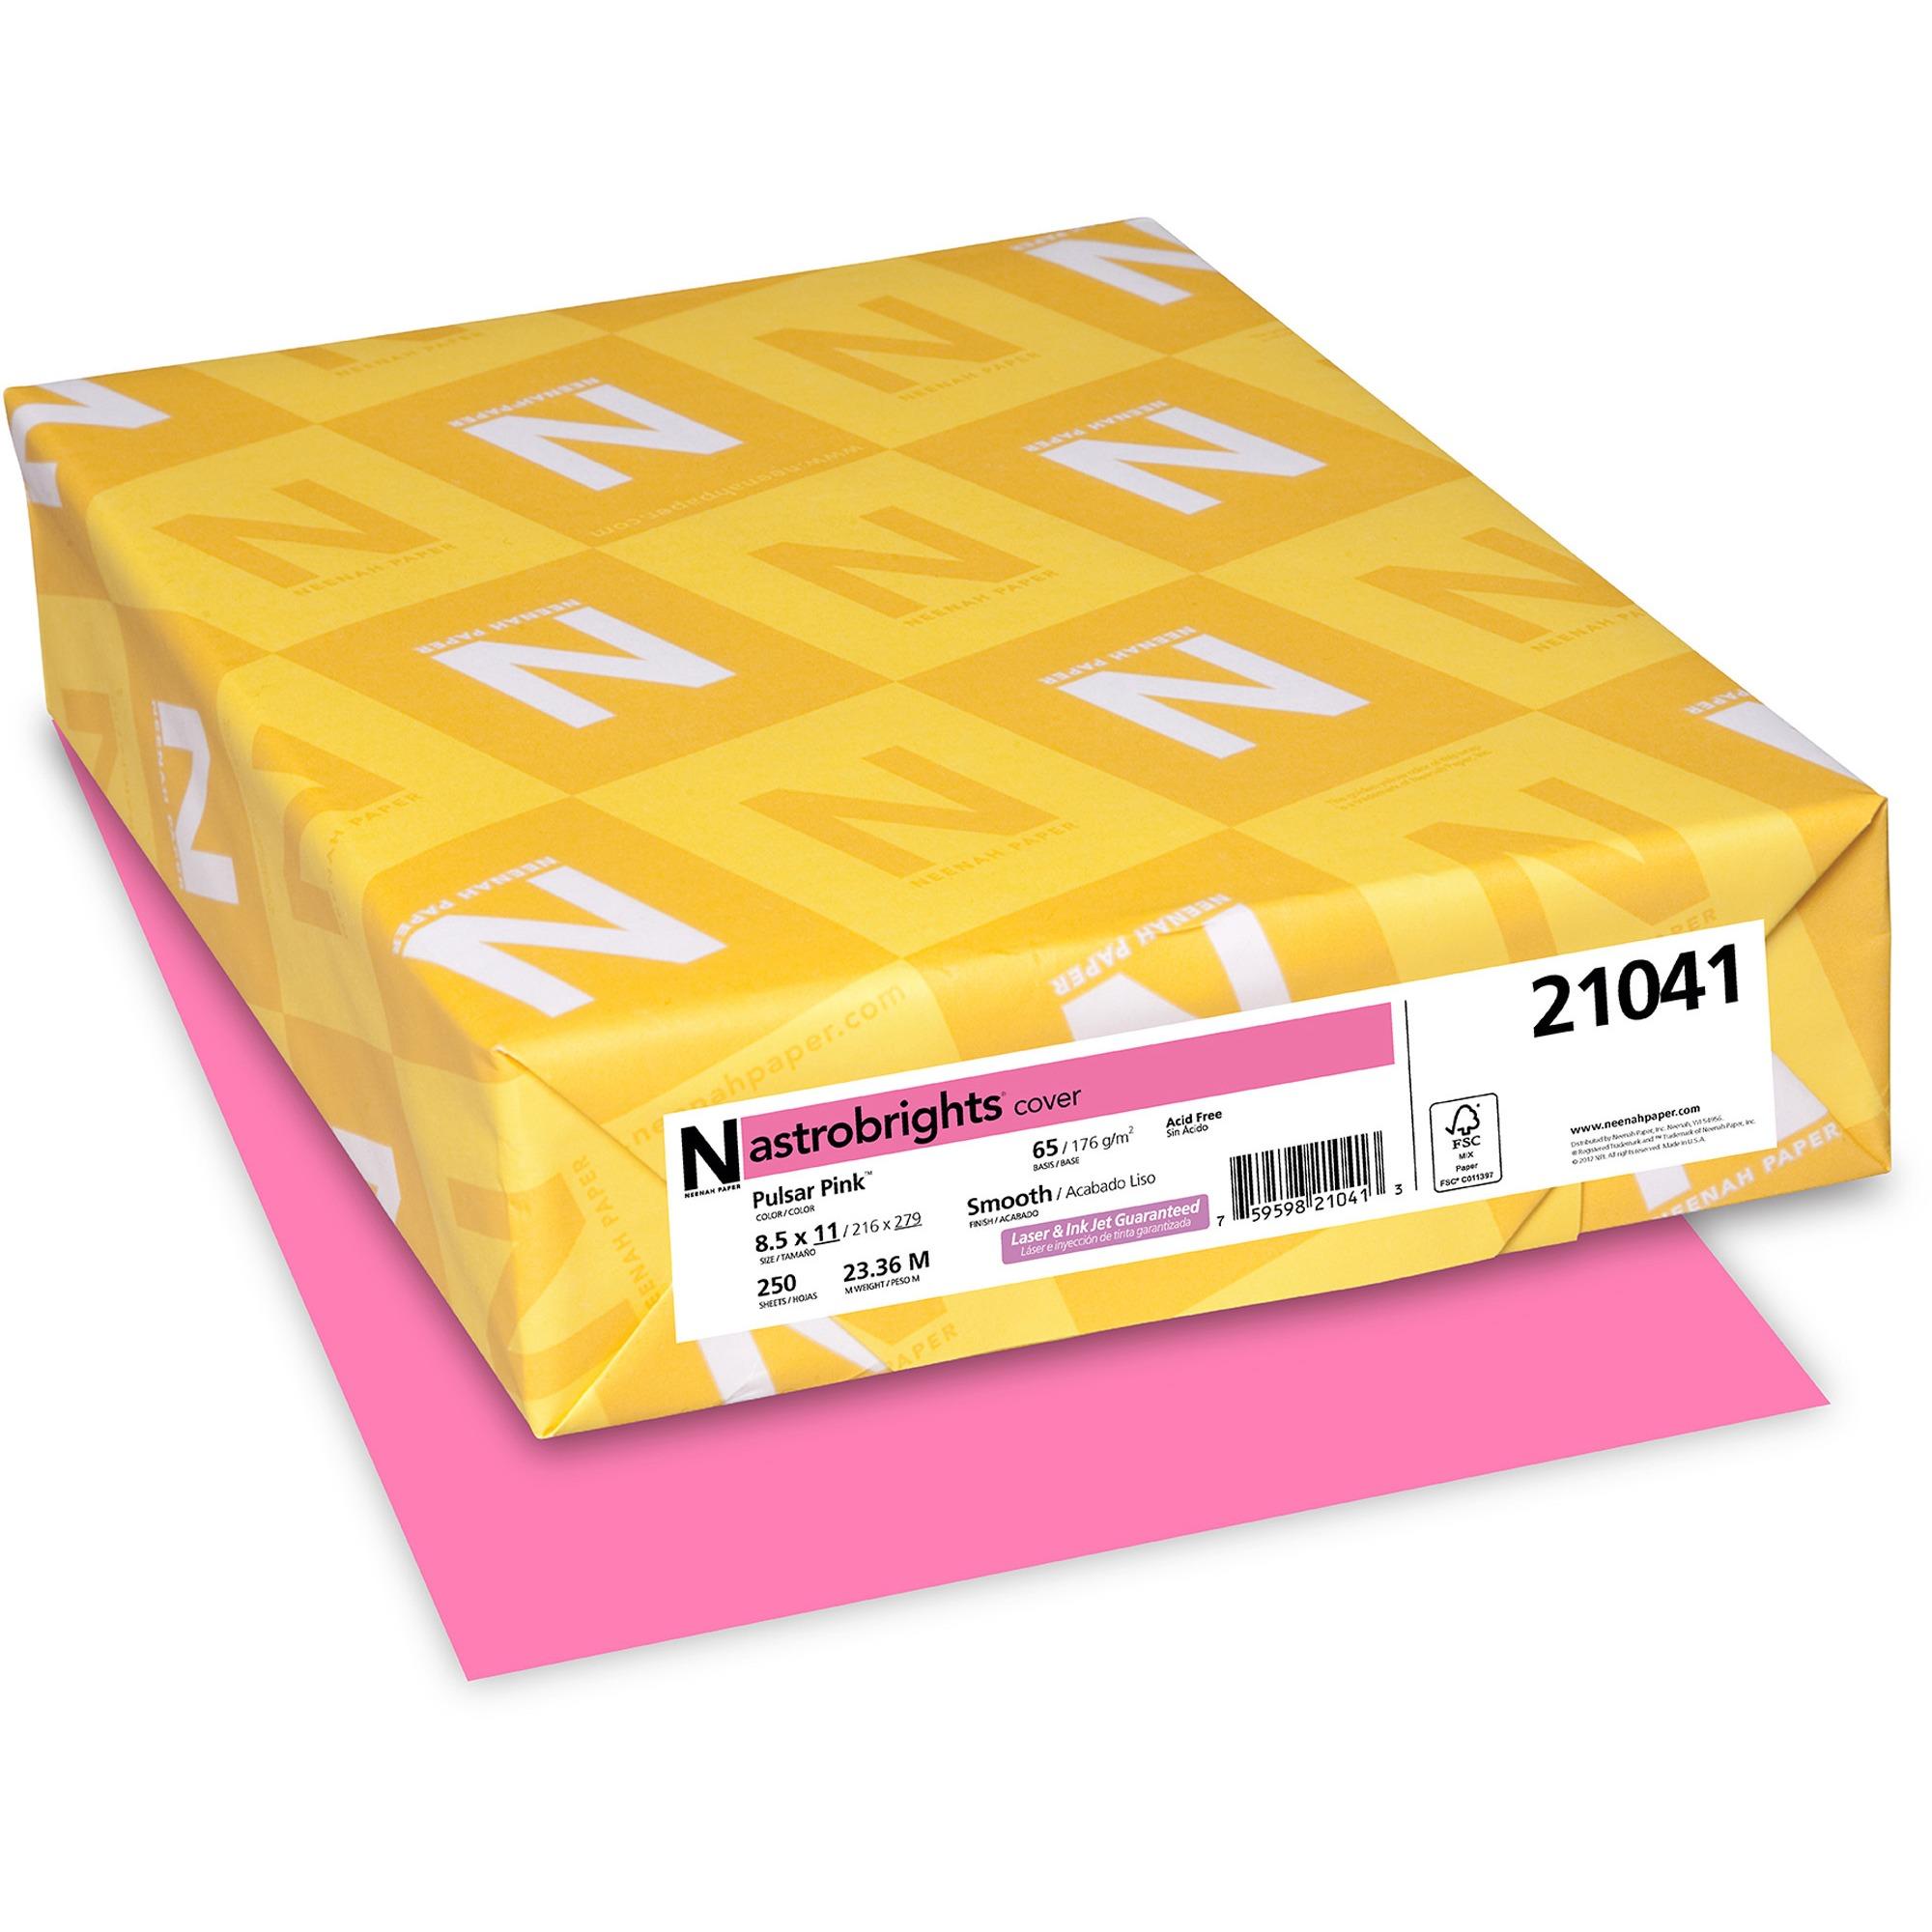 "Astrobrights Color Cardstock, Pulsar Pink, 8.5"" X 11"", 250 Count"